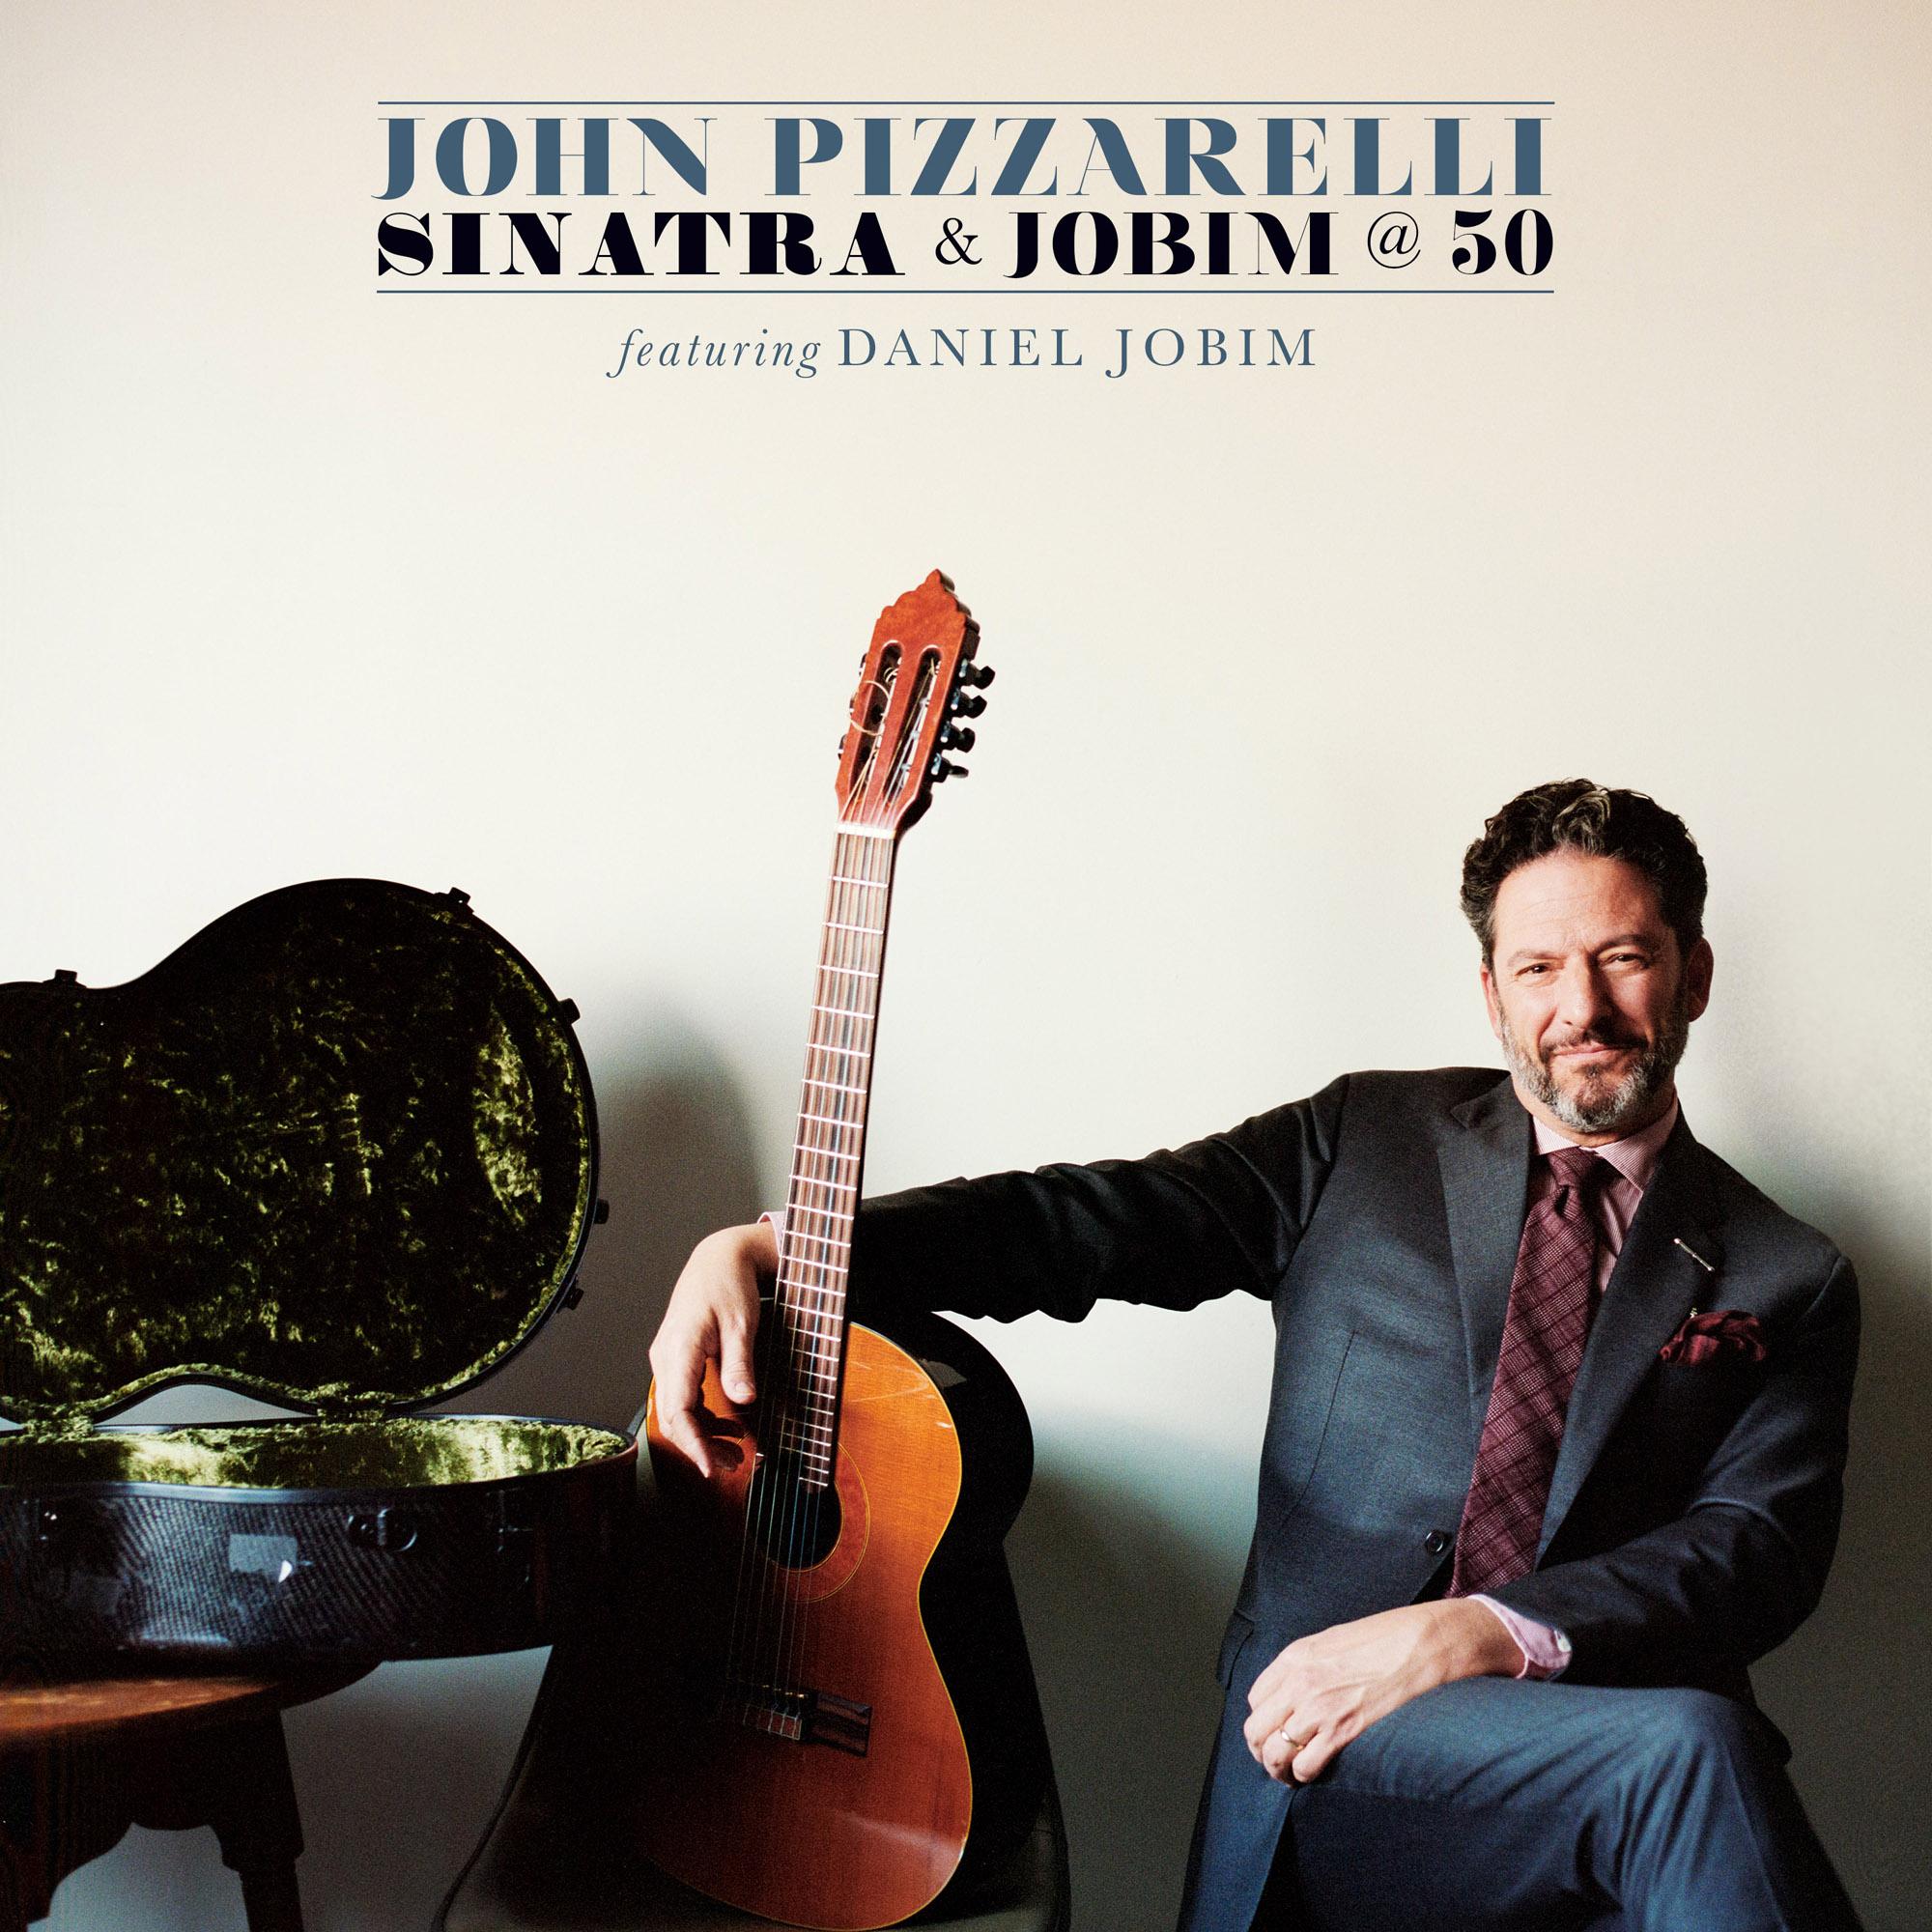 John Pizzarelli - Sinatra & Jobim @ 50